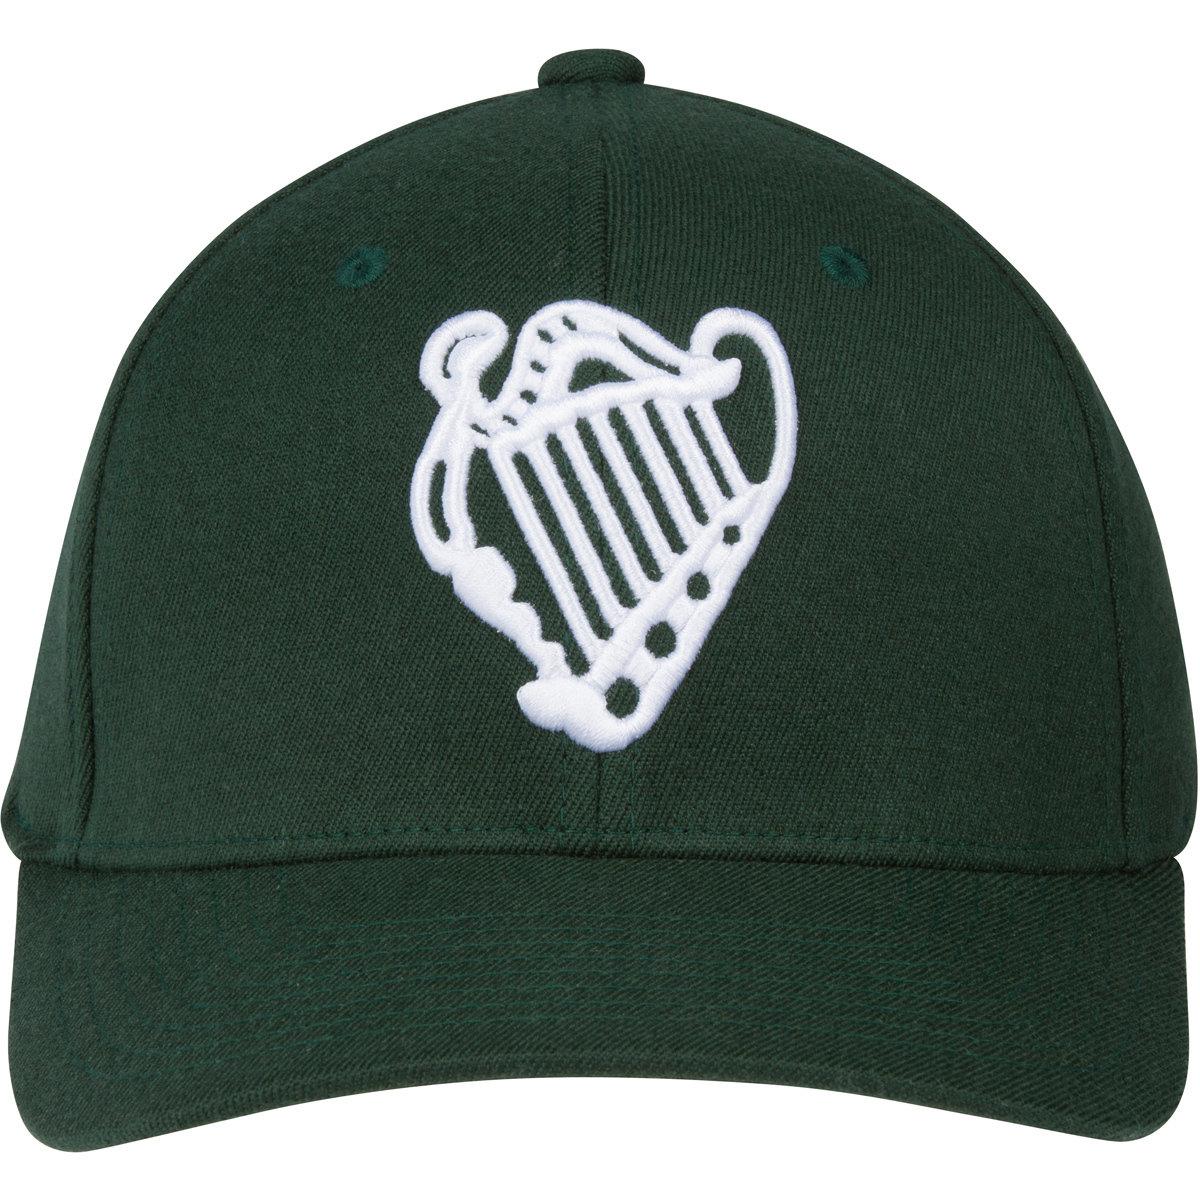 Irish National Baseball Team Flexfit Cap by Richardson IRLNATFLXCAP022